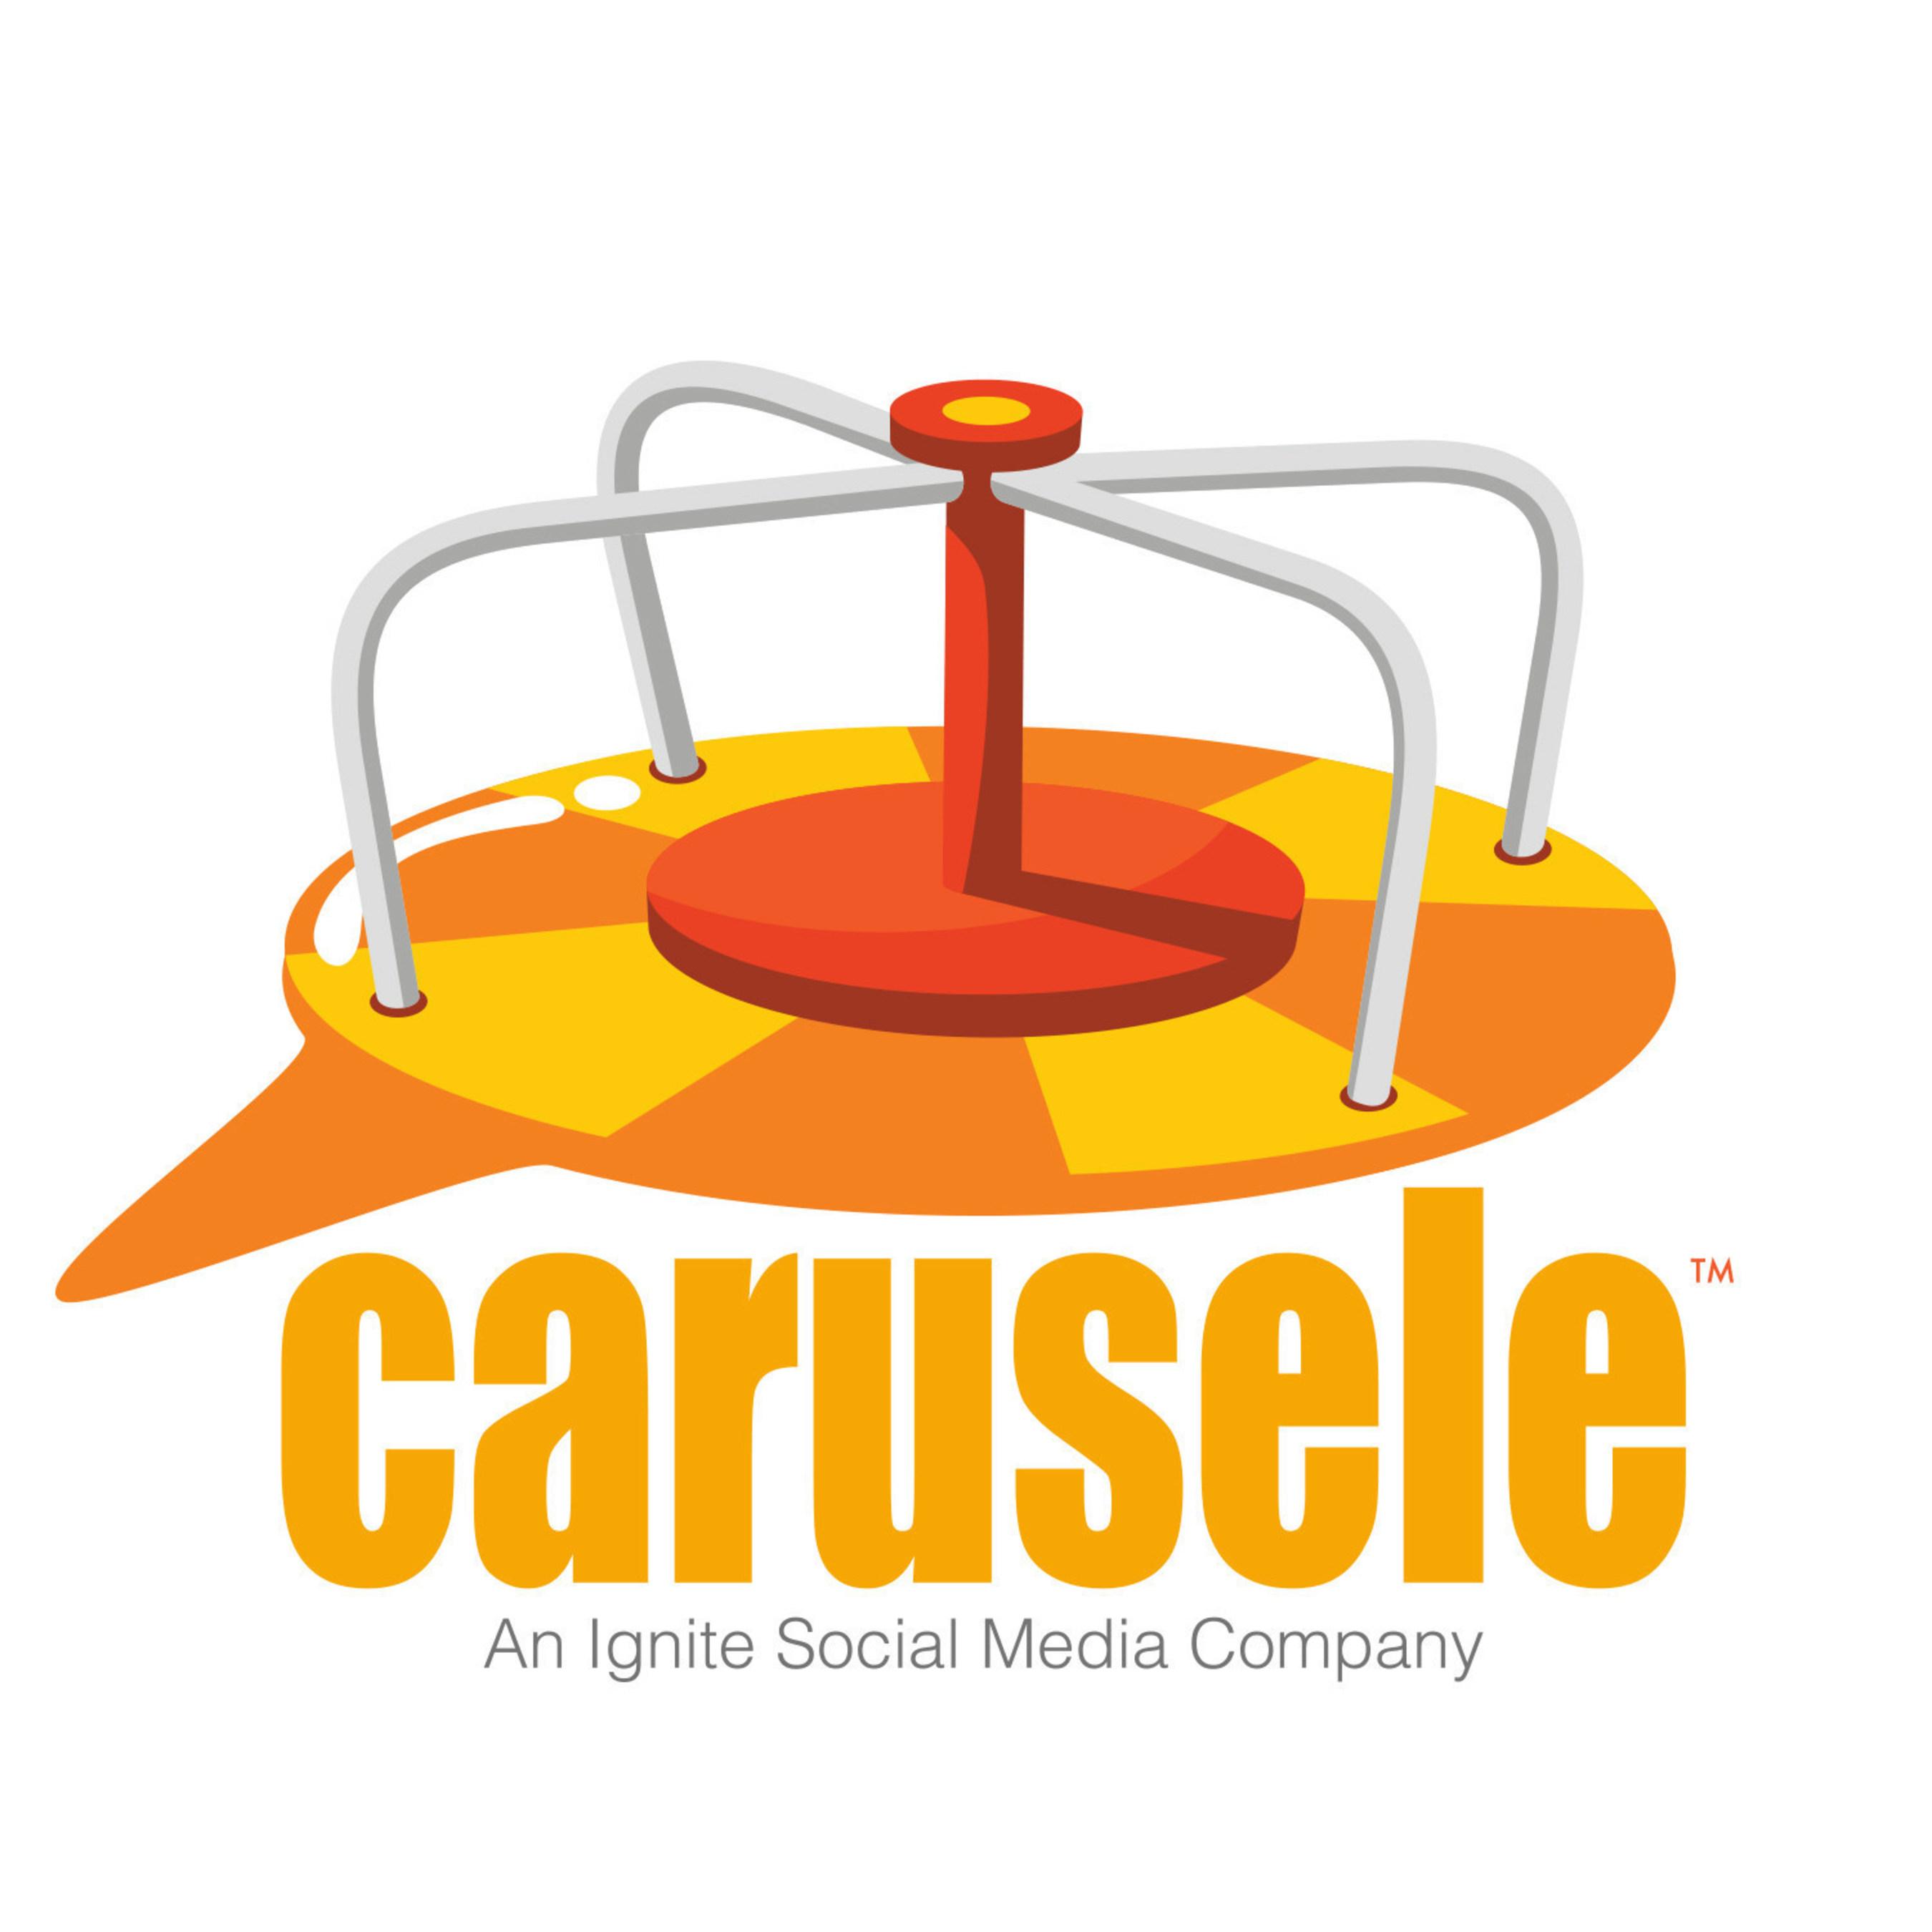 Ignite Social Media(R) launches Carusele(TM) content marketing platform Friday 3/13 at SXSW in Austin, Texas